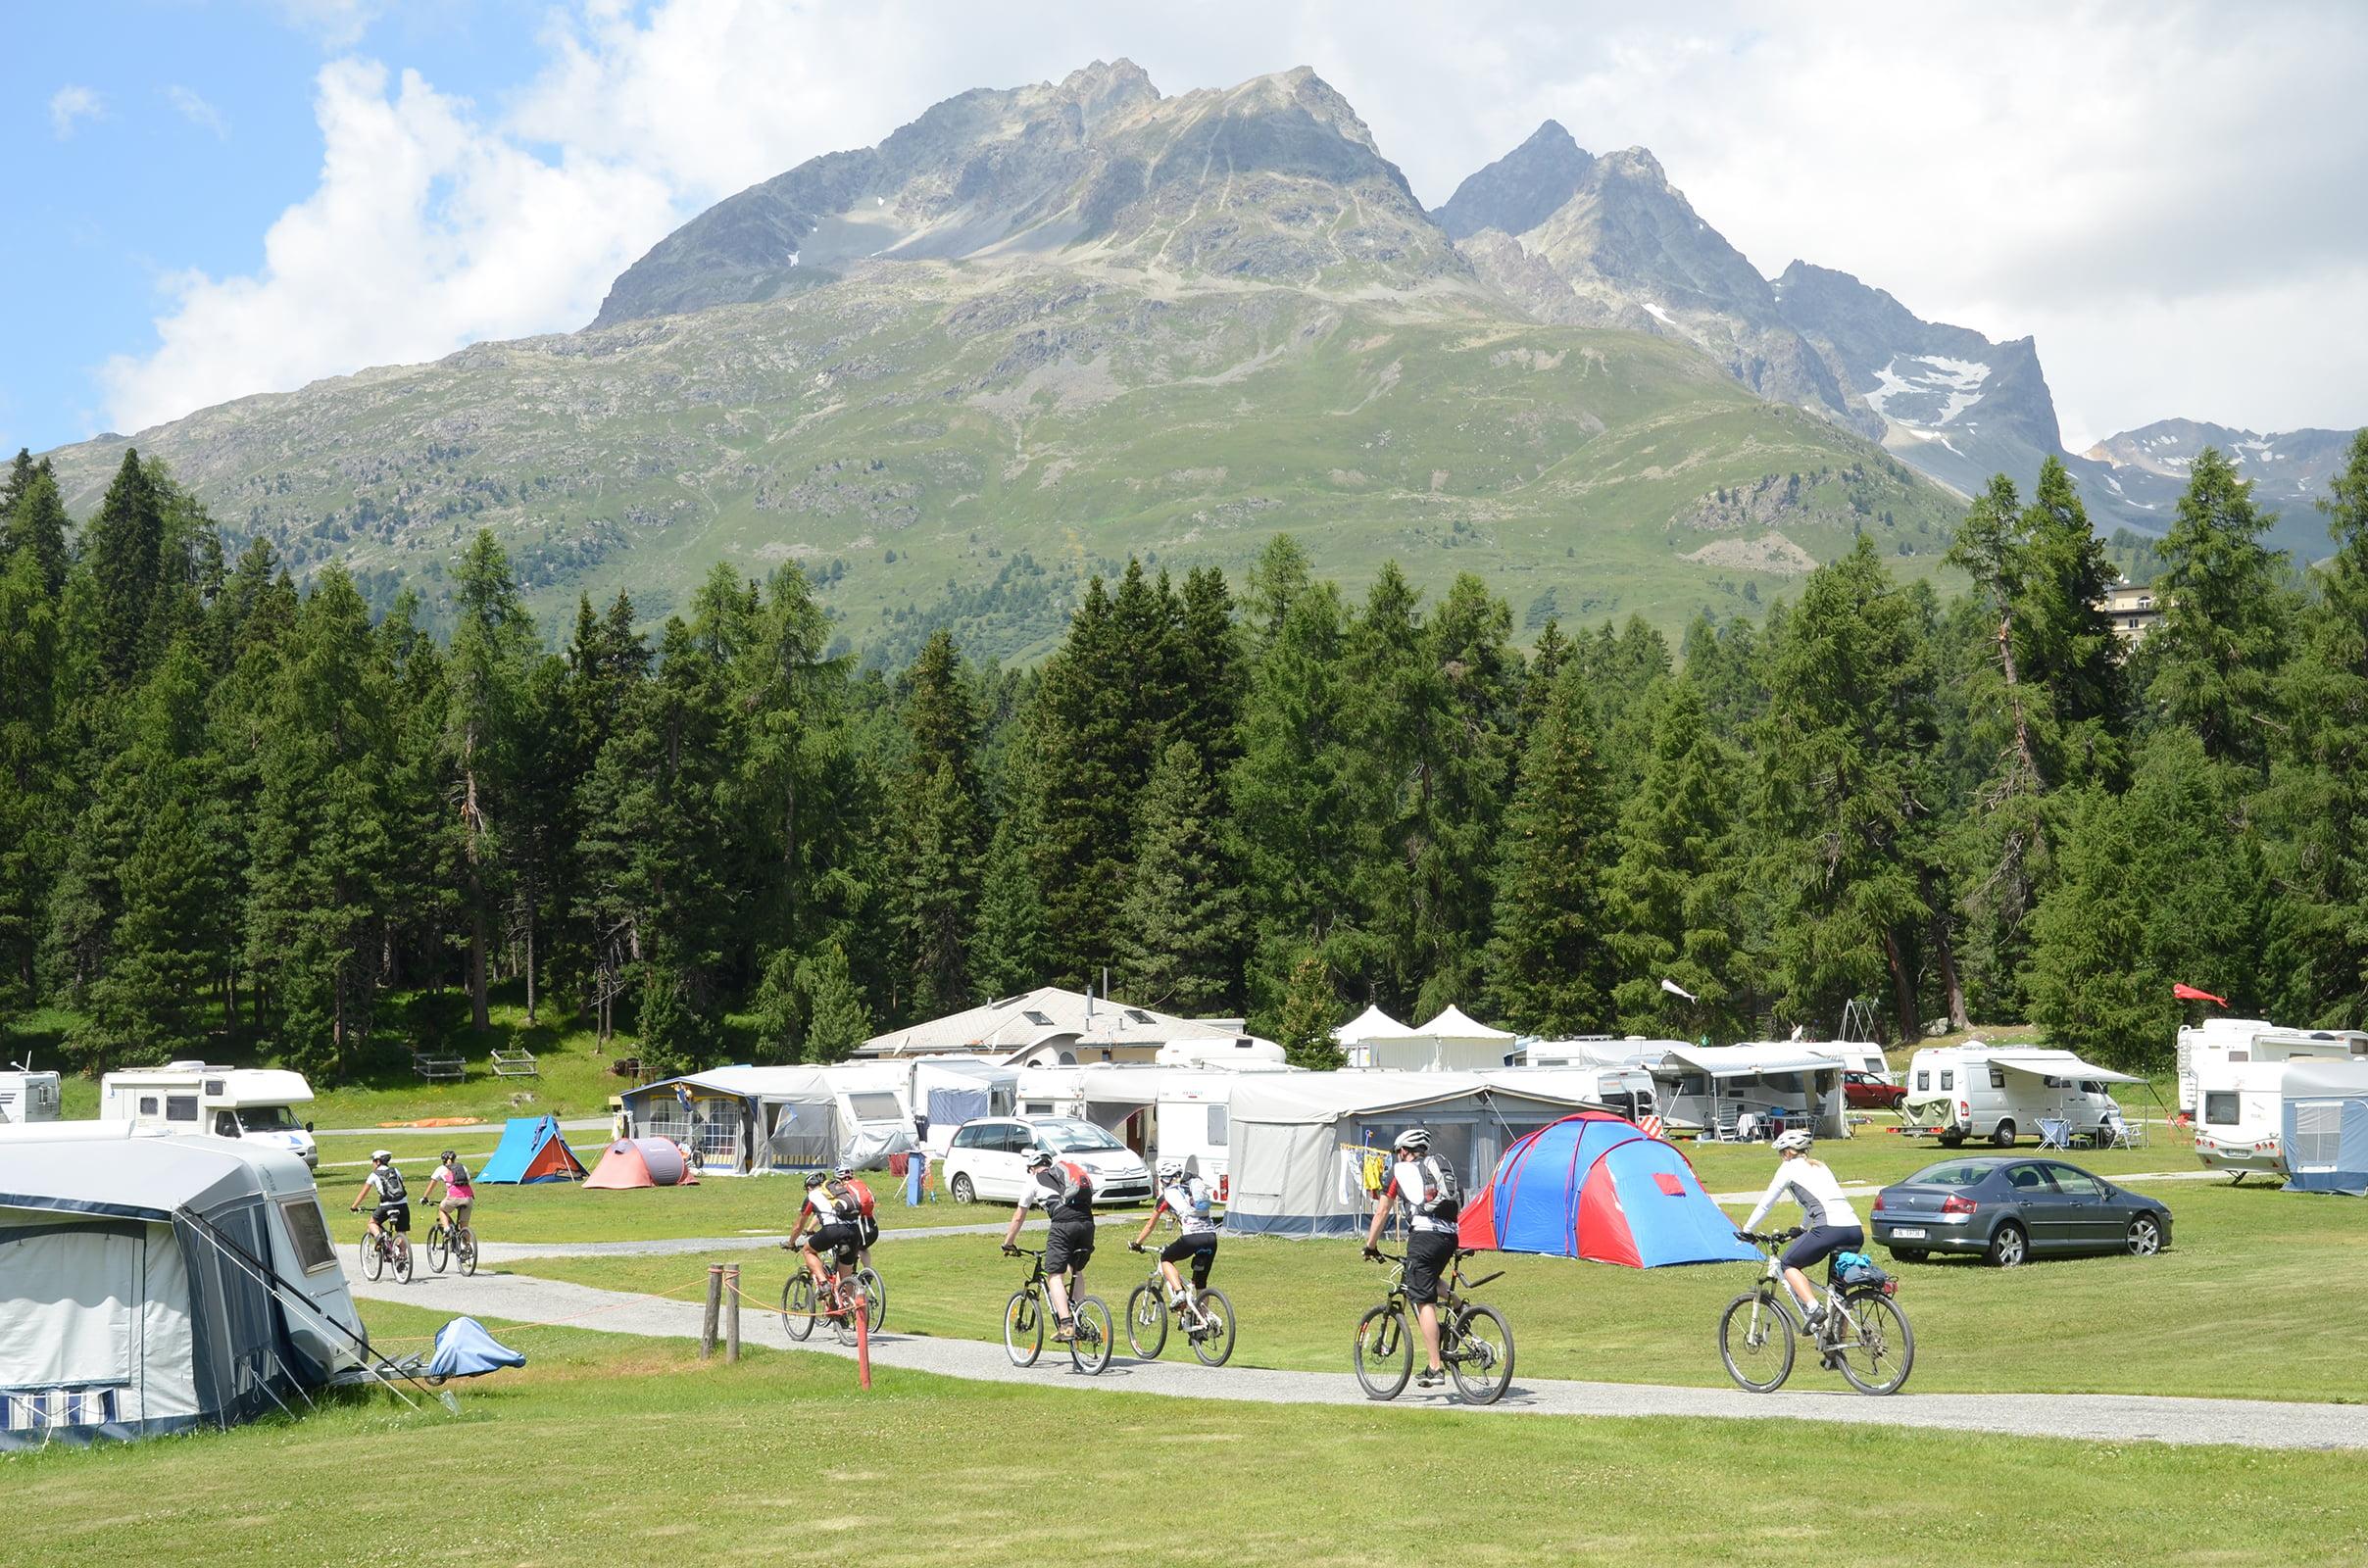 TCS Camping, St. Moritz